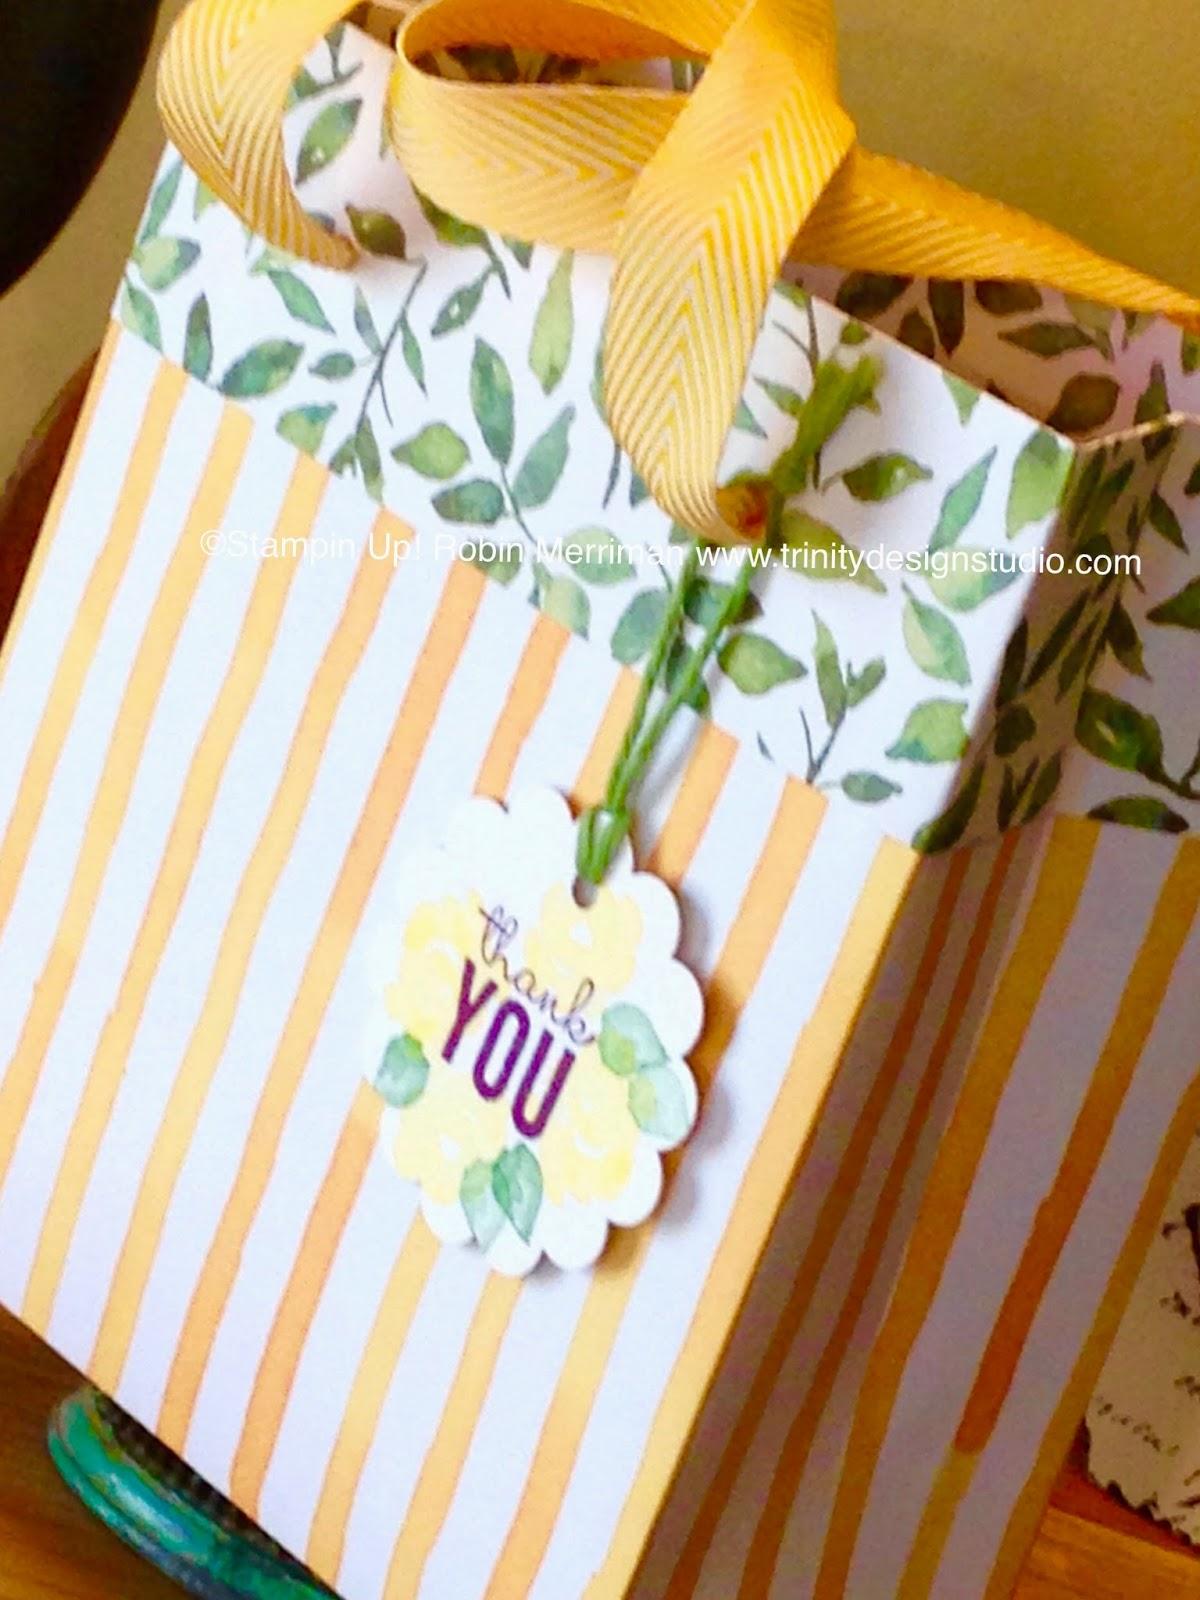 Trinity Designs Pretty Paper Gift Bag Paperweek